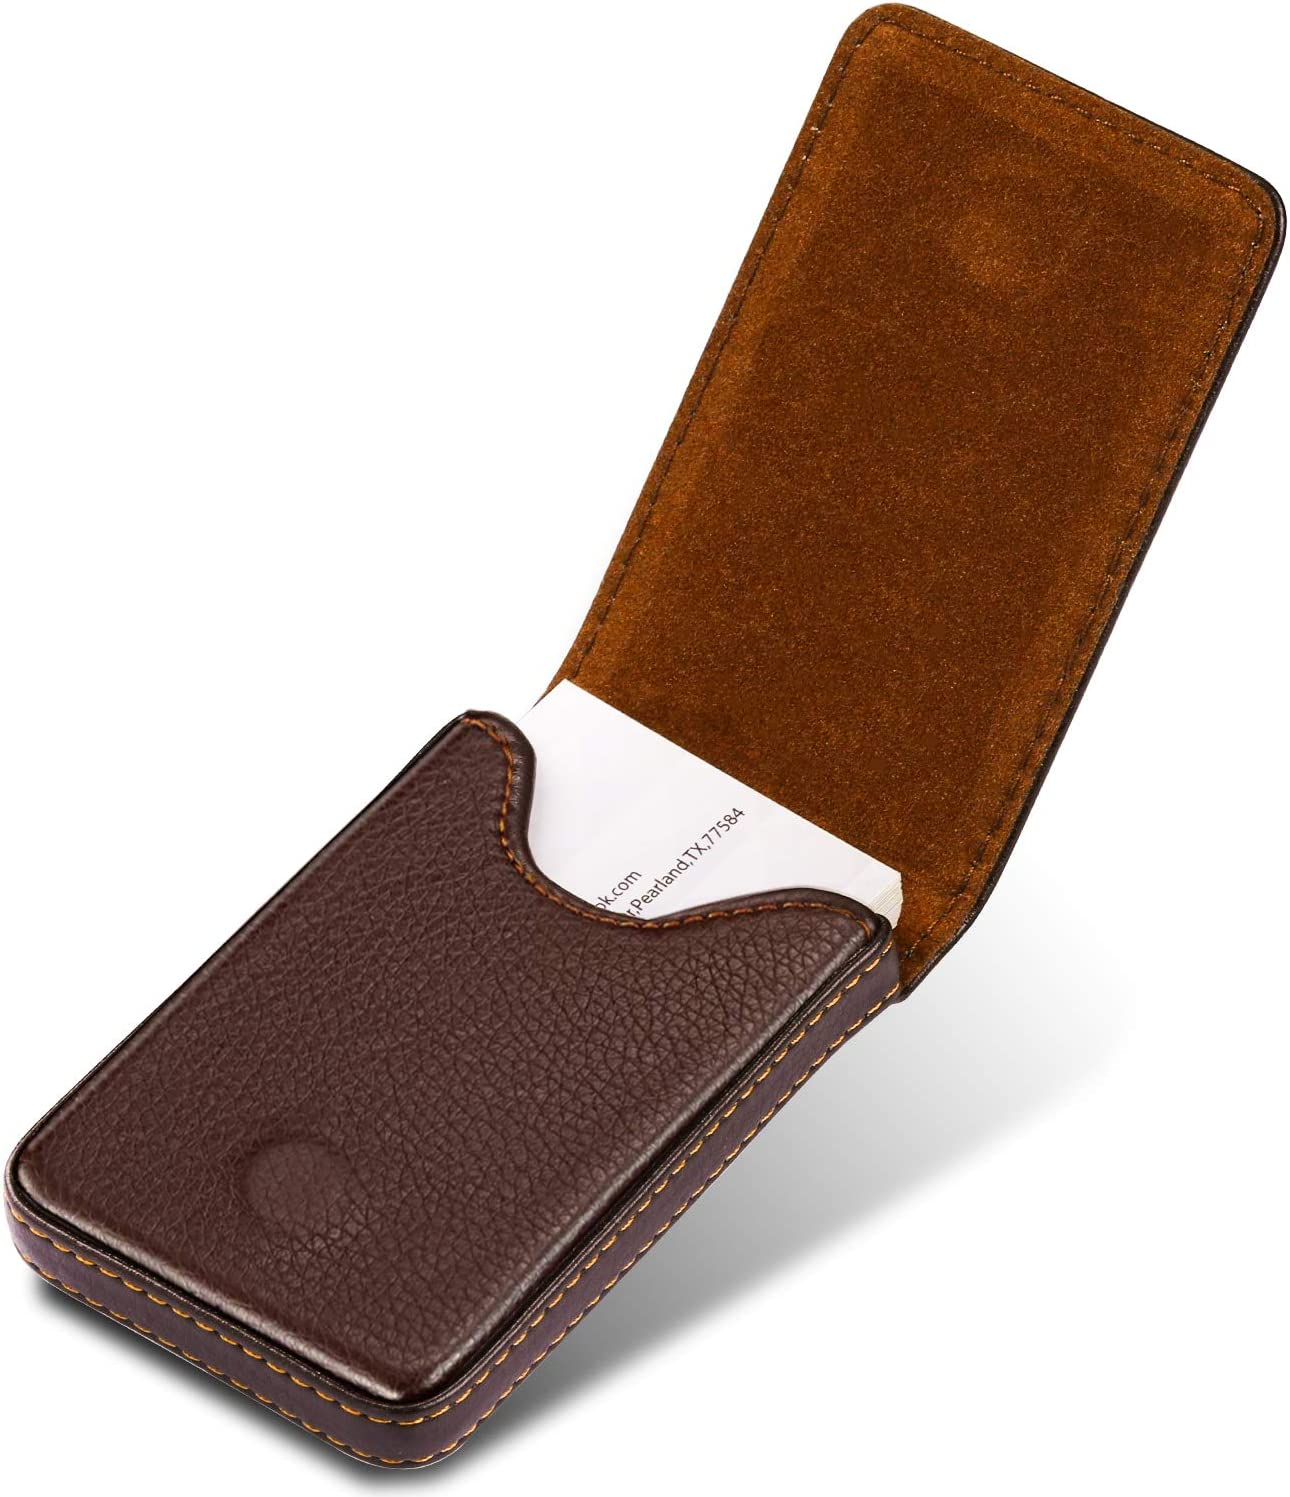 MaxGear Leather Business Card Holder Case for Men or Women Name Card Case Holder